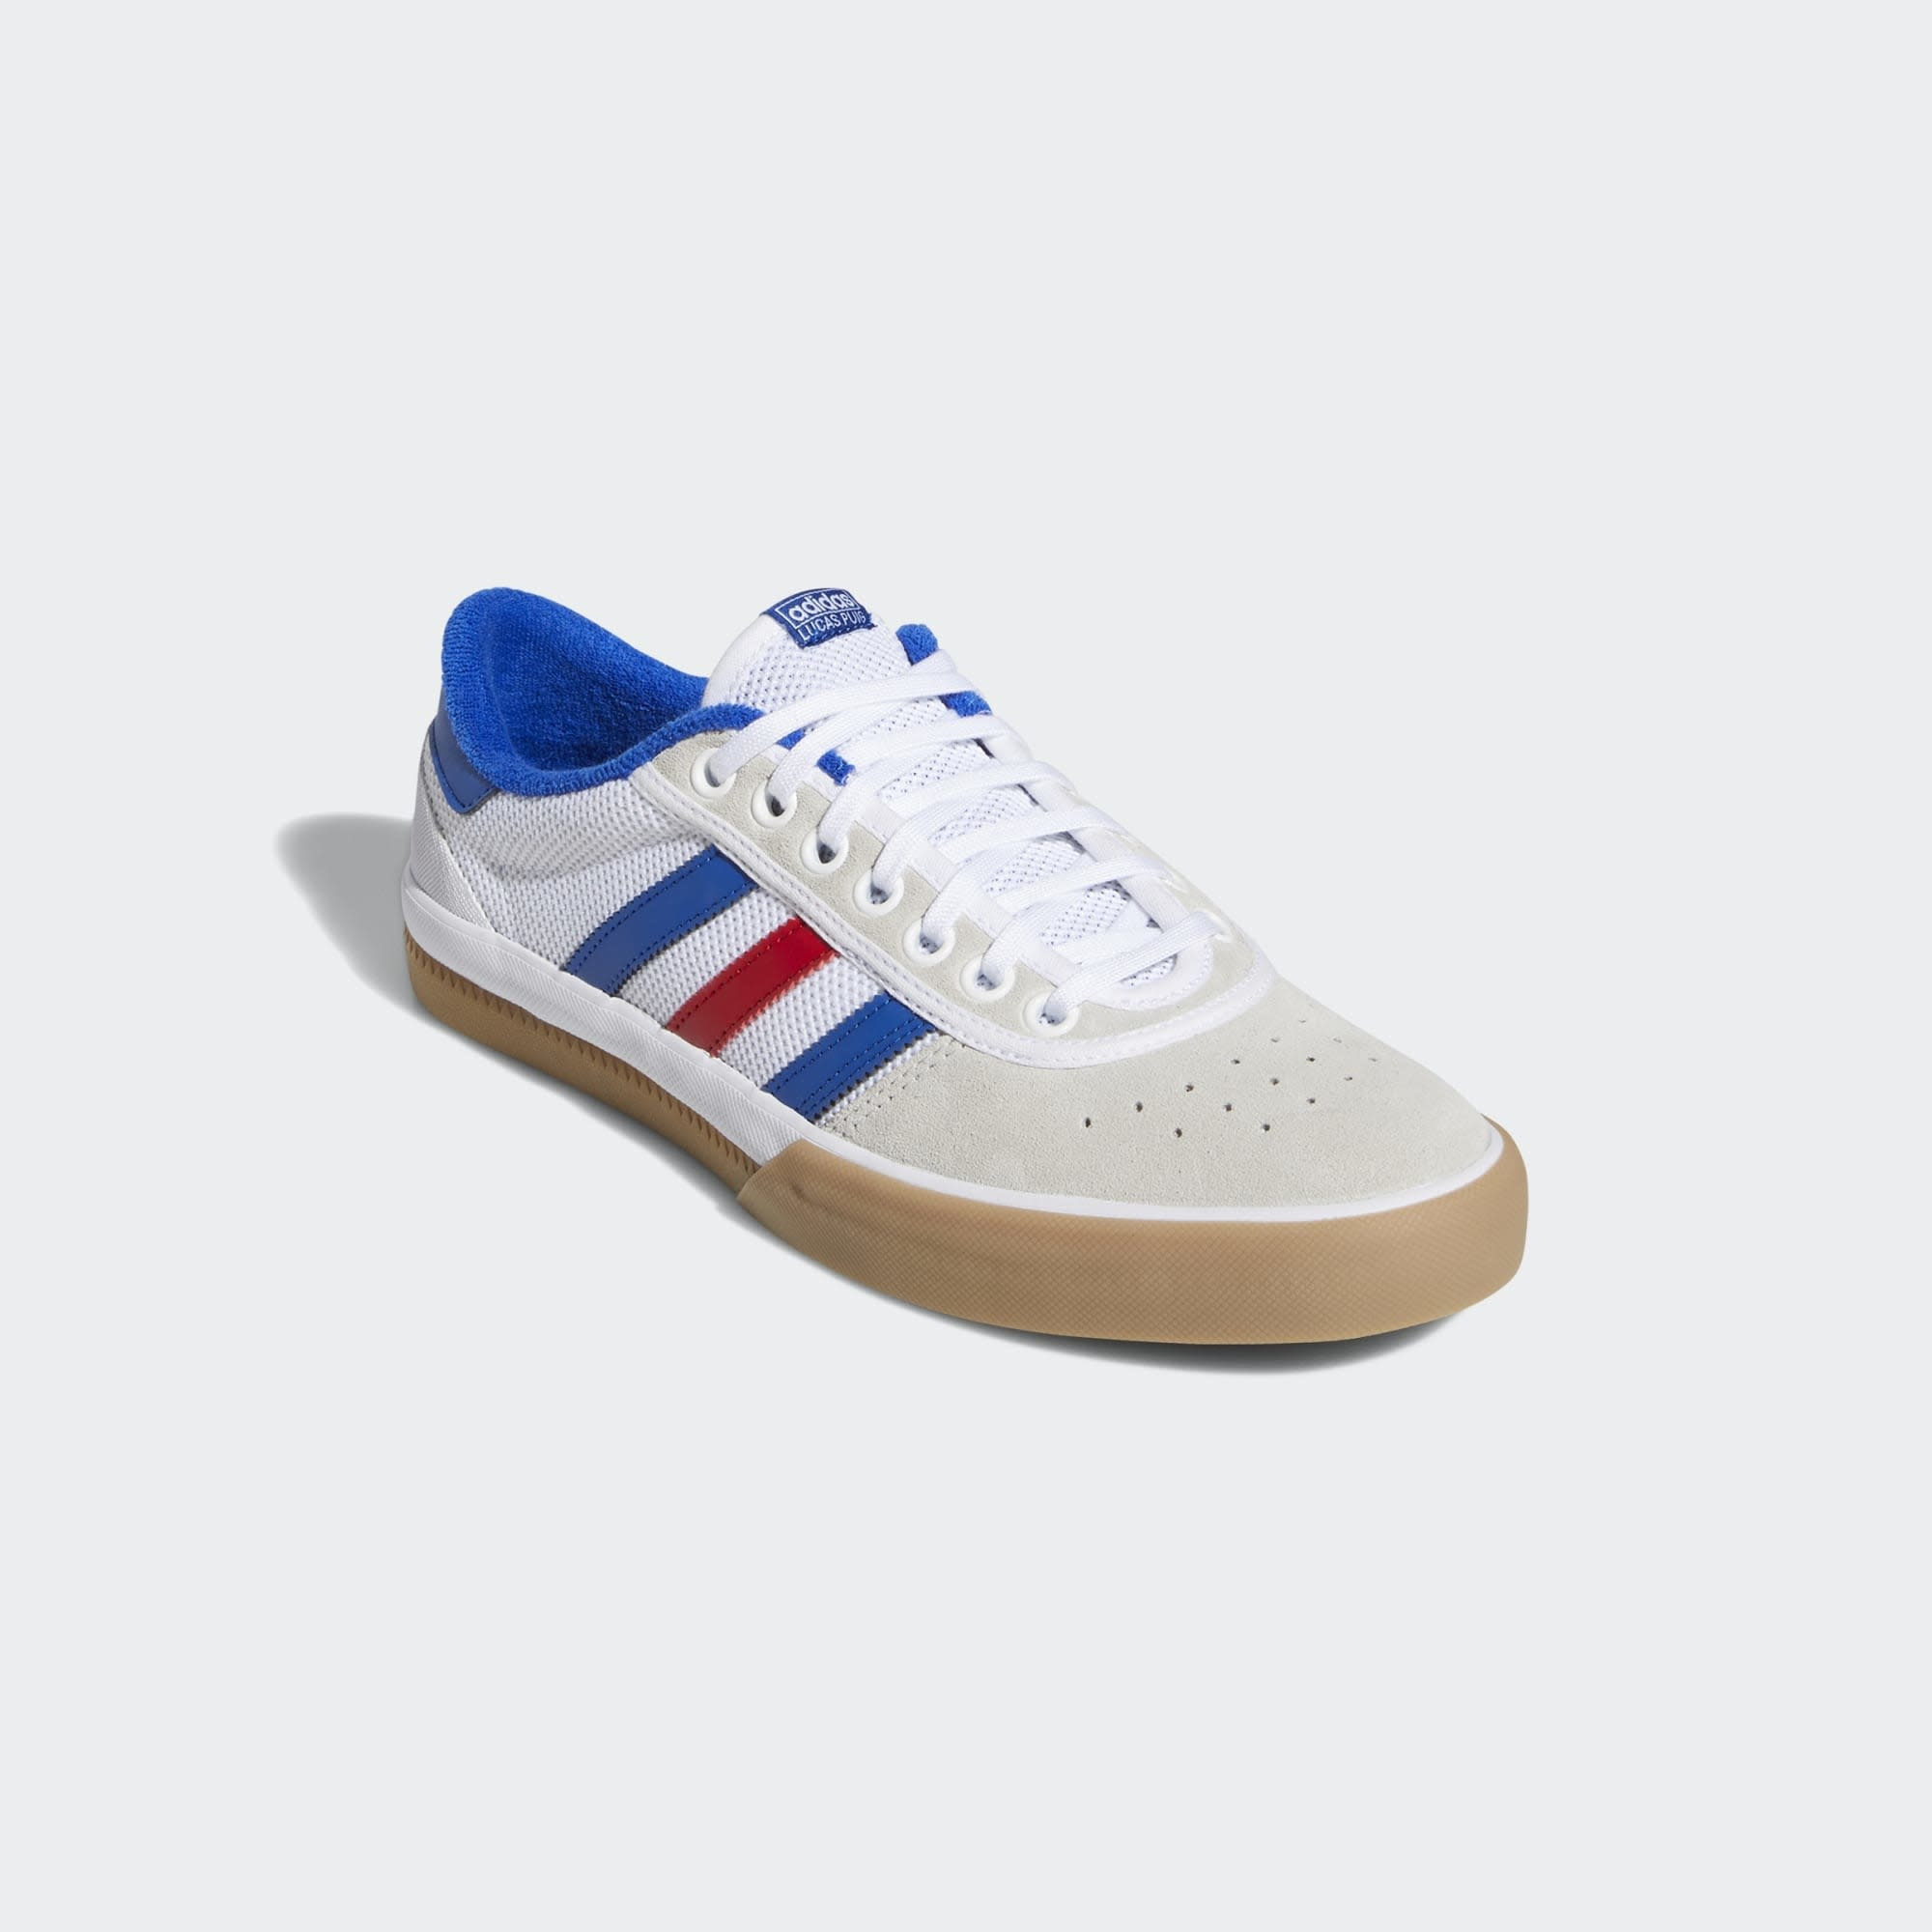 Adidas Lucas Prem. White/Royal